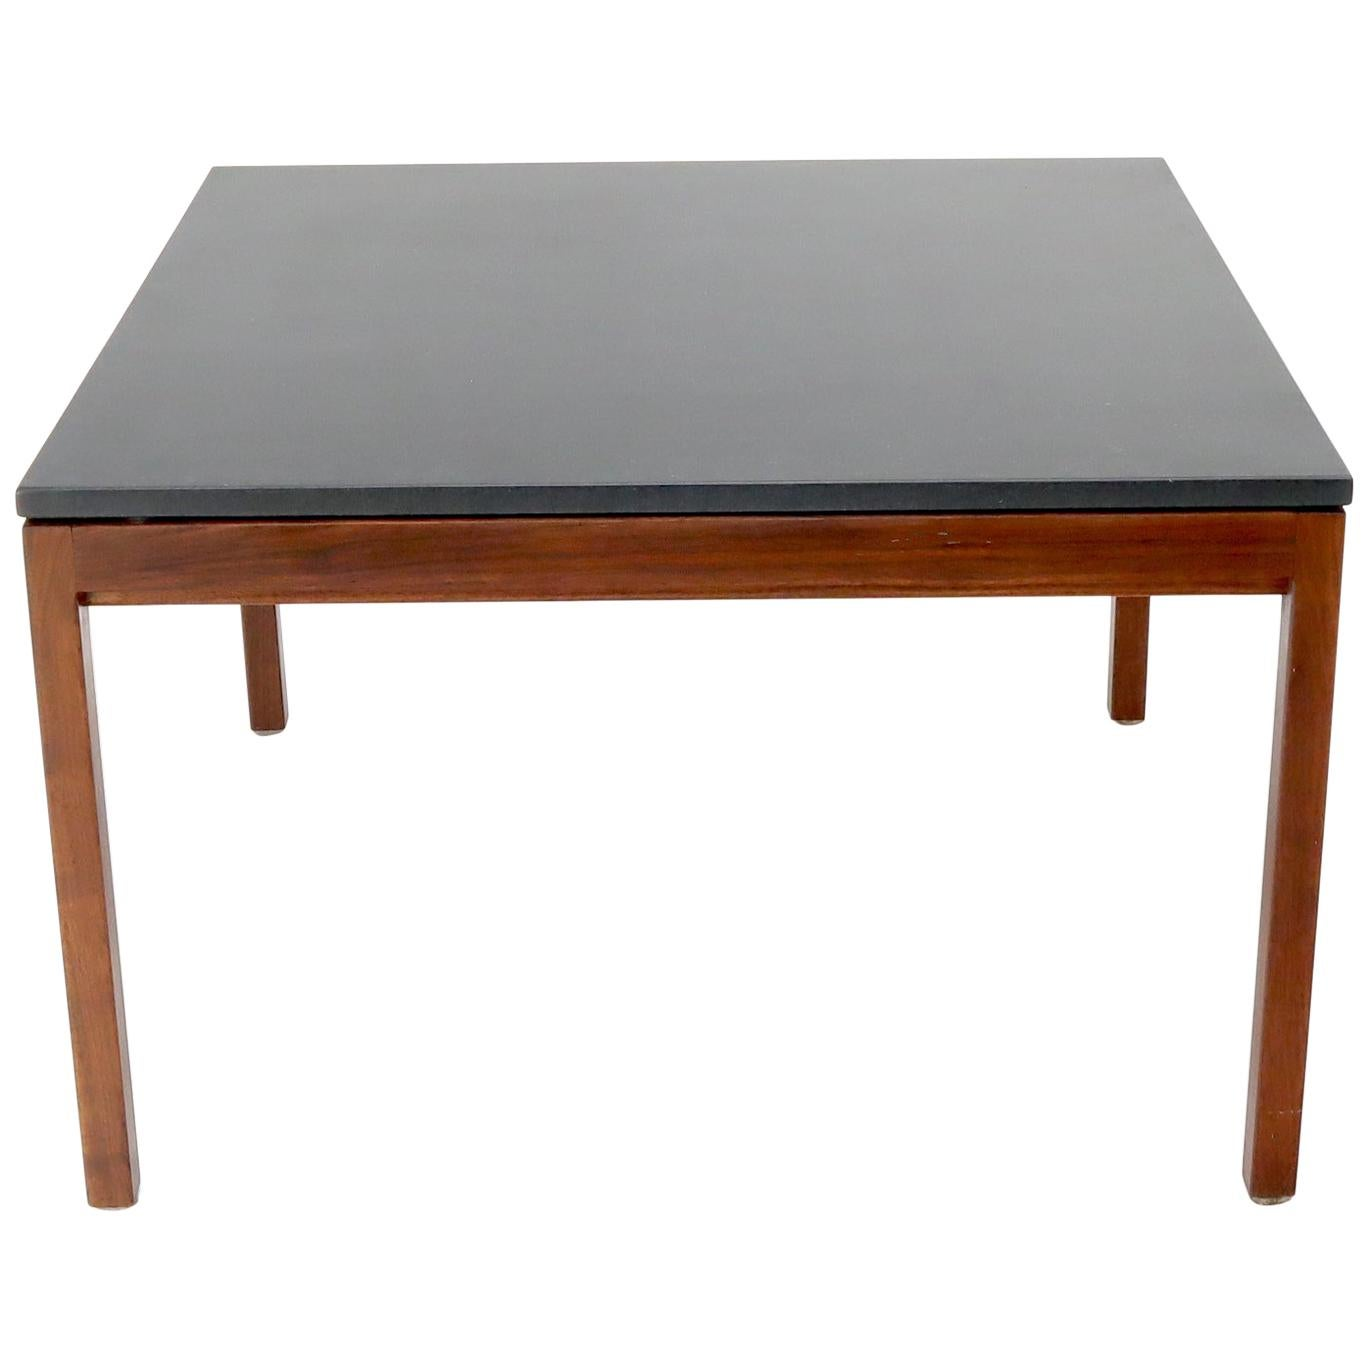 Square Slate Top Walnut Base Coffee Table by Jens Risom